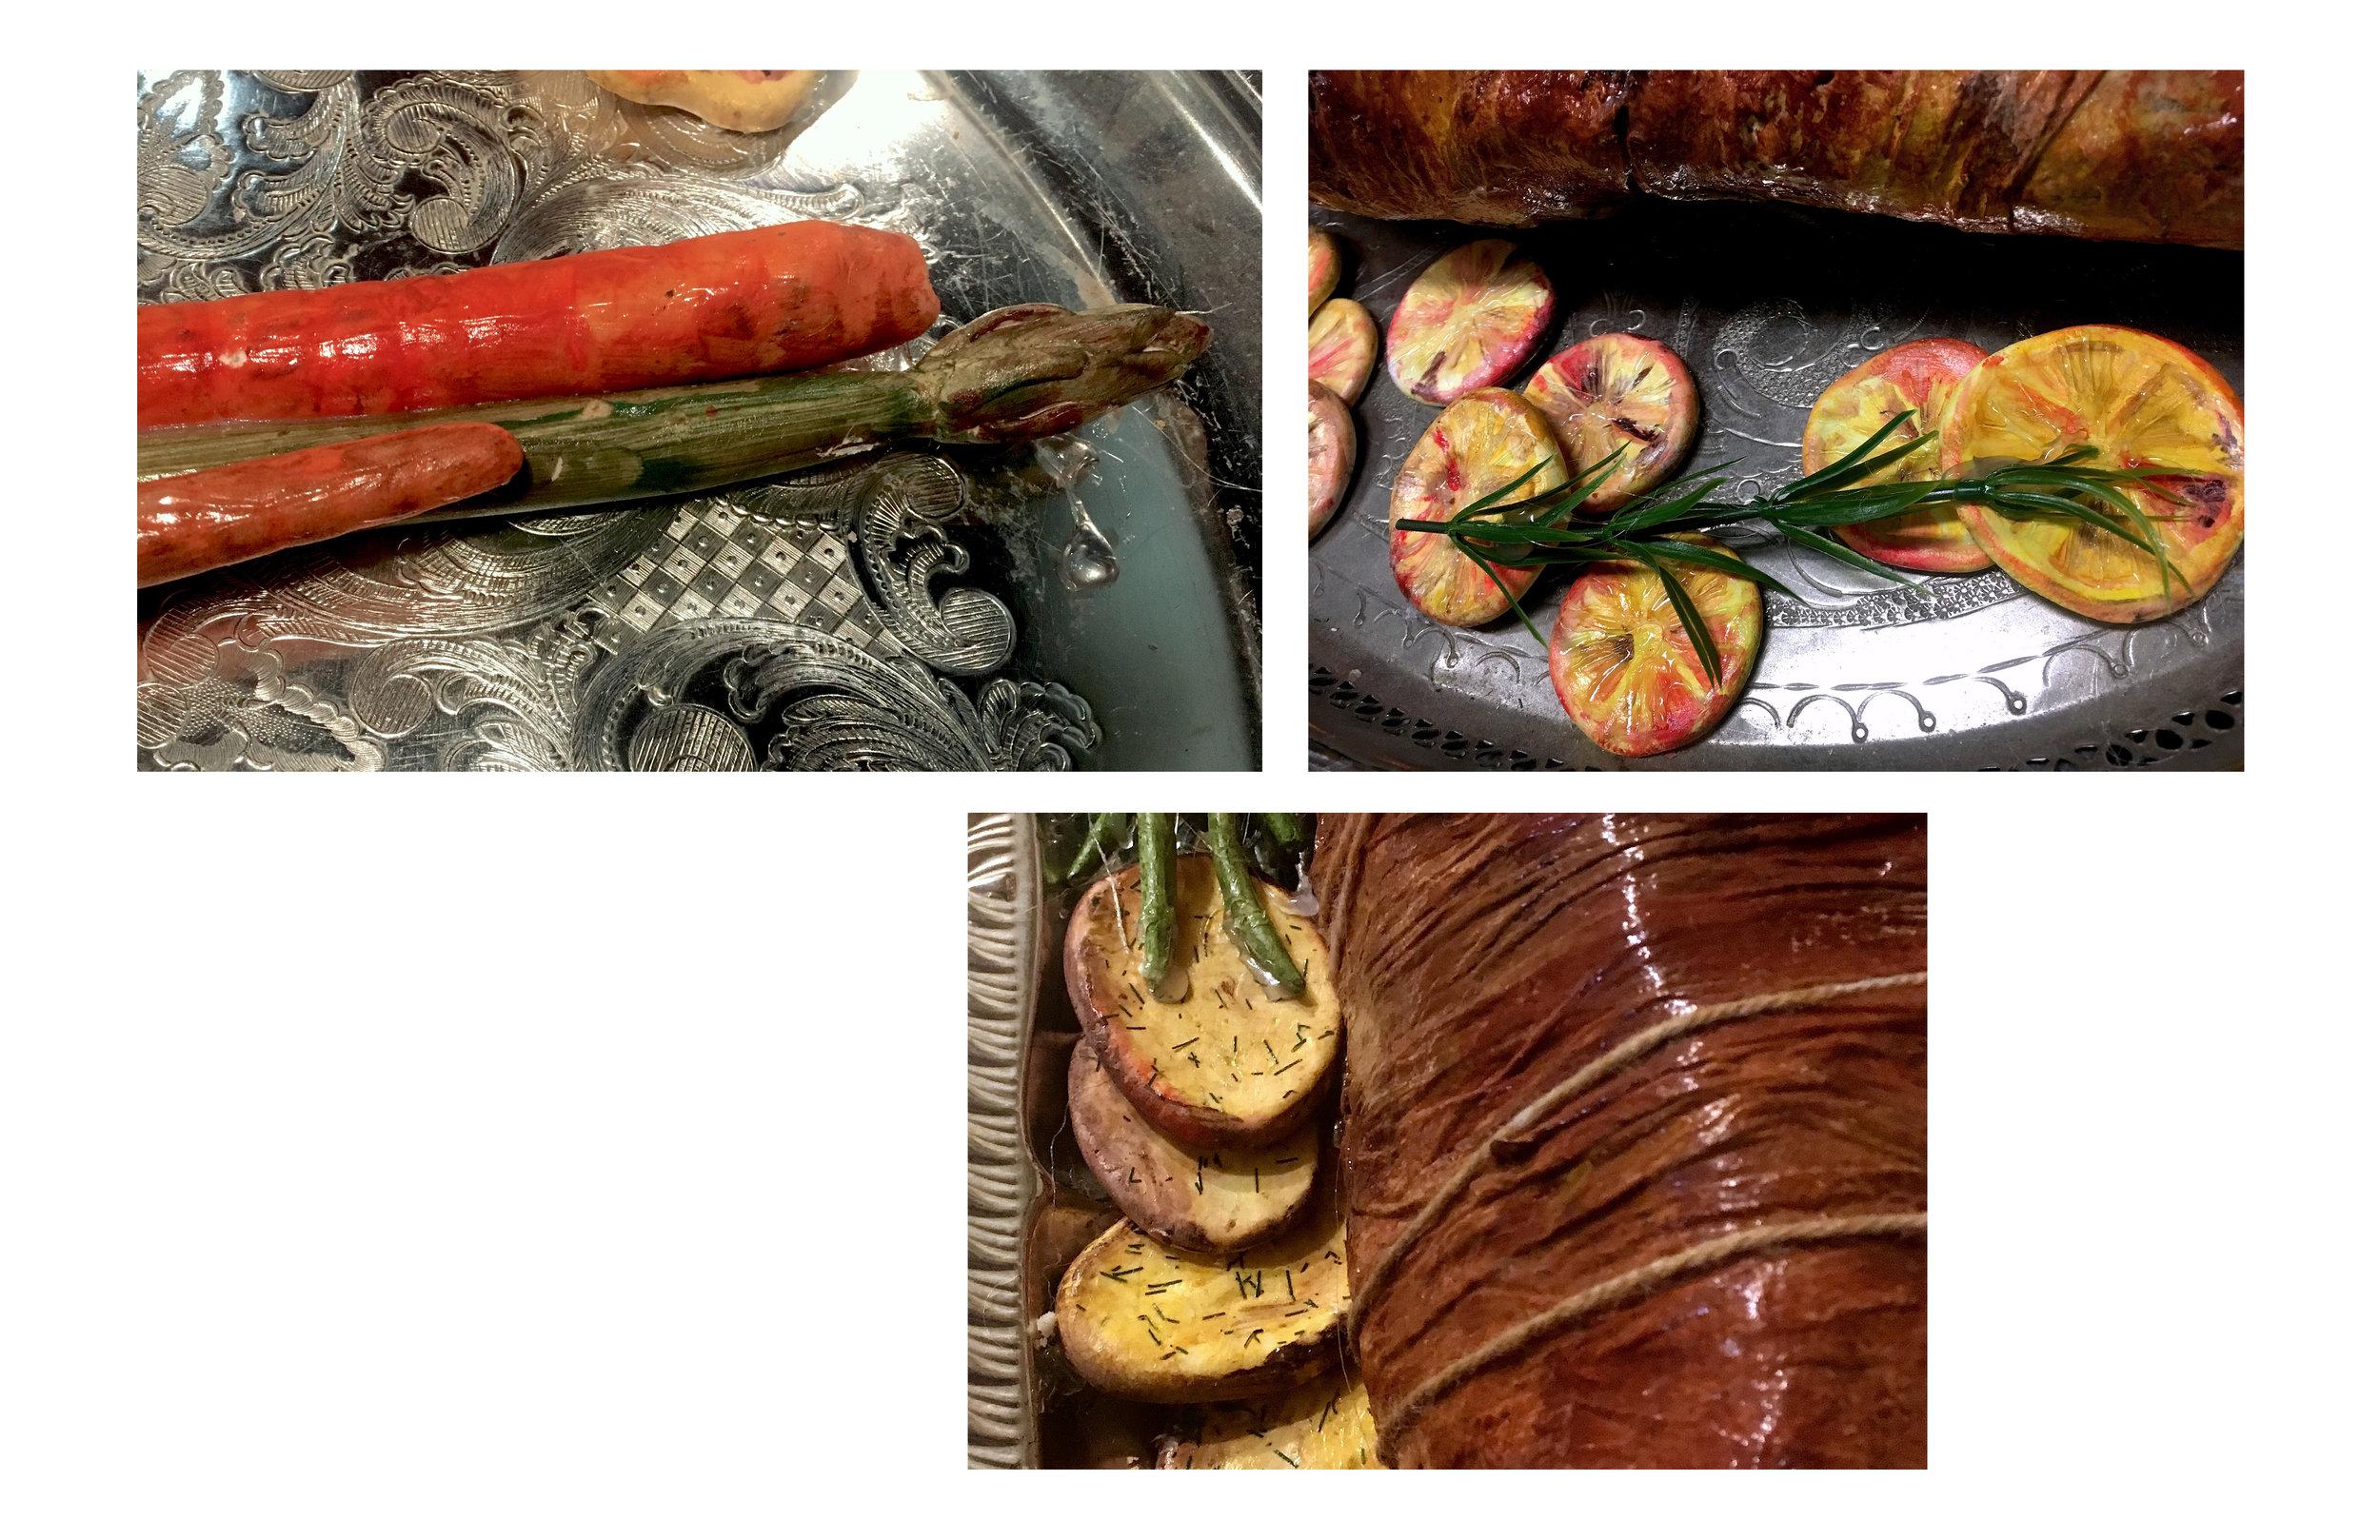 Roast dressings: grilled carrots and asparagus, roasted lemons, roasted potatoes